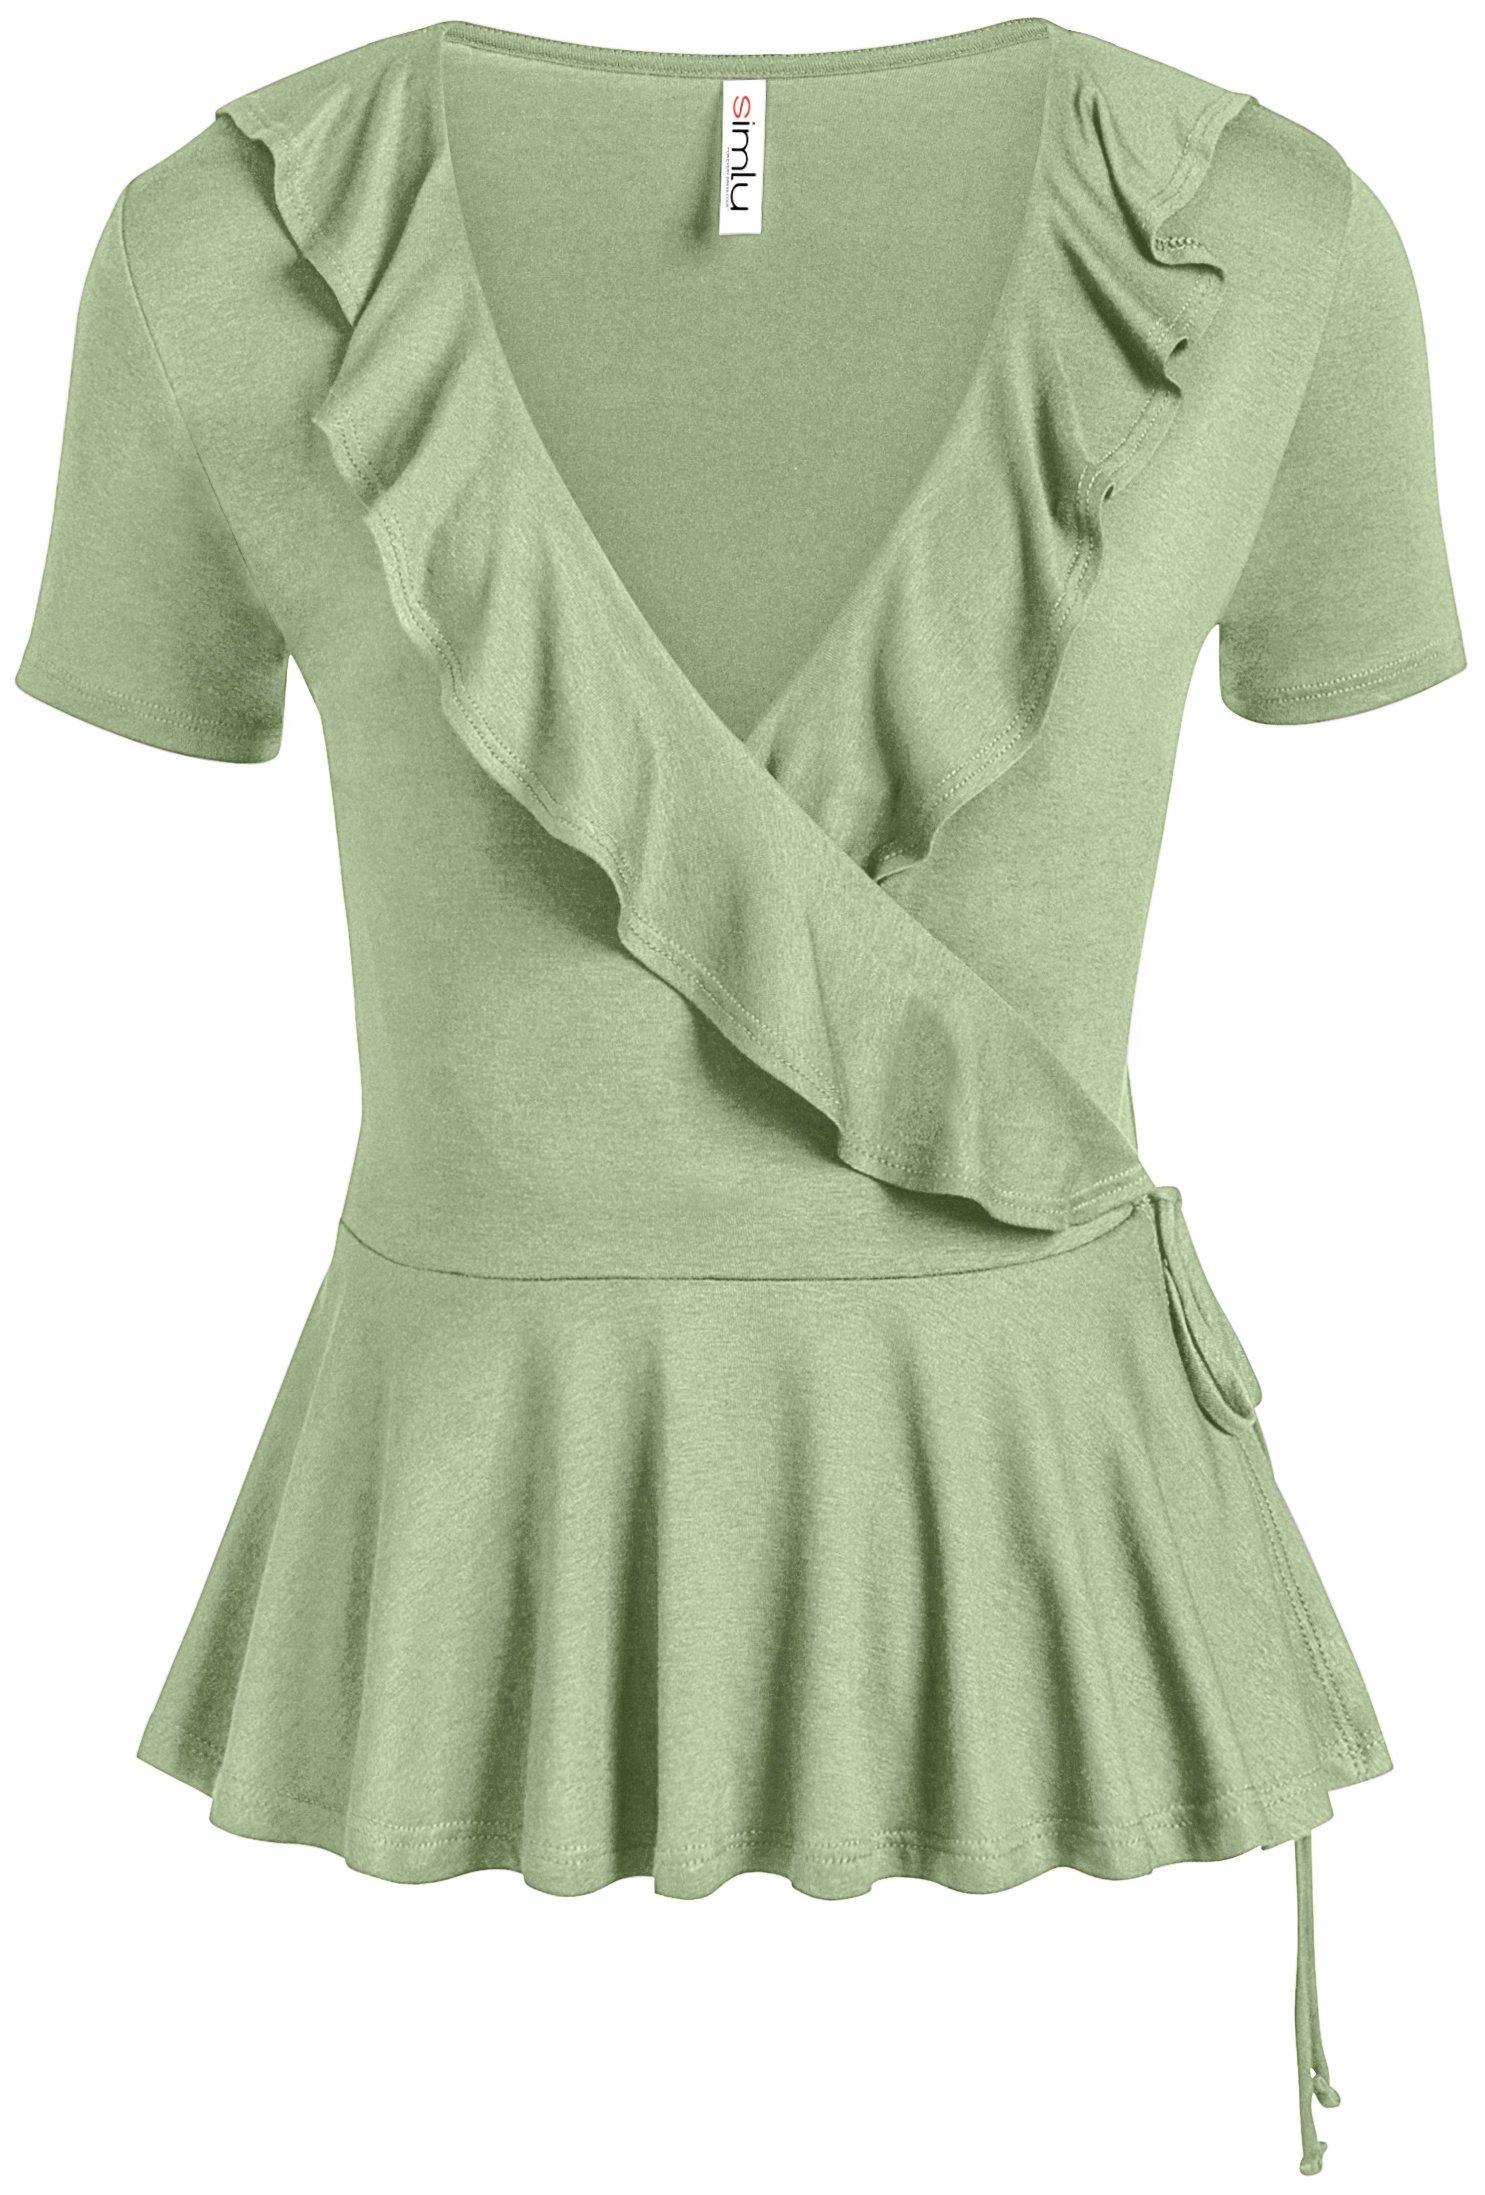 Womens Sage Green Wrap Top V Neck Peplum Blouse Self Tie Ruffle Hem Wrap Top (Size Large US 8-10, Sage)